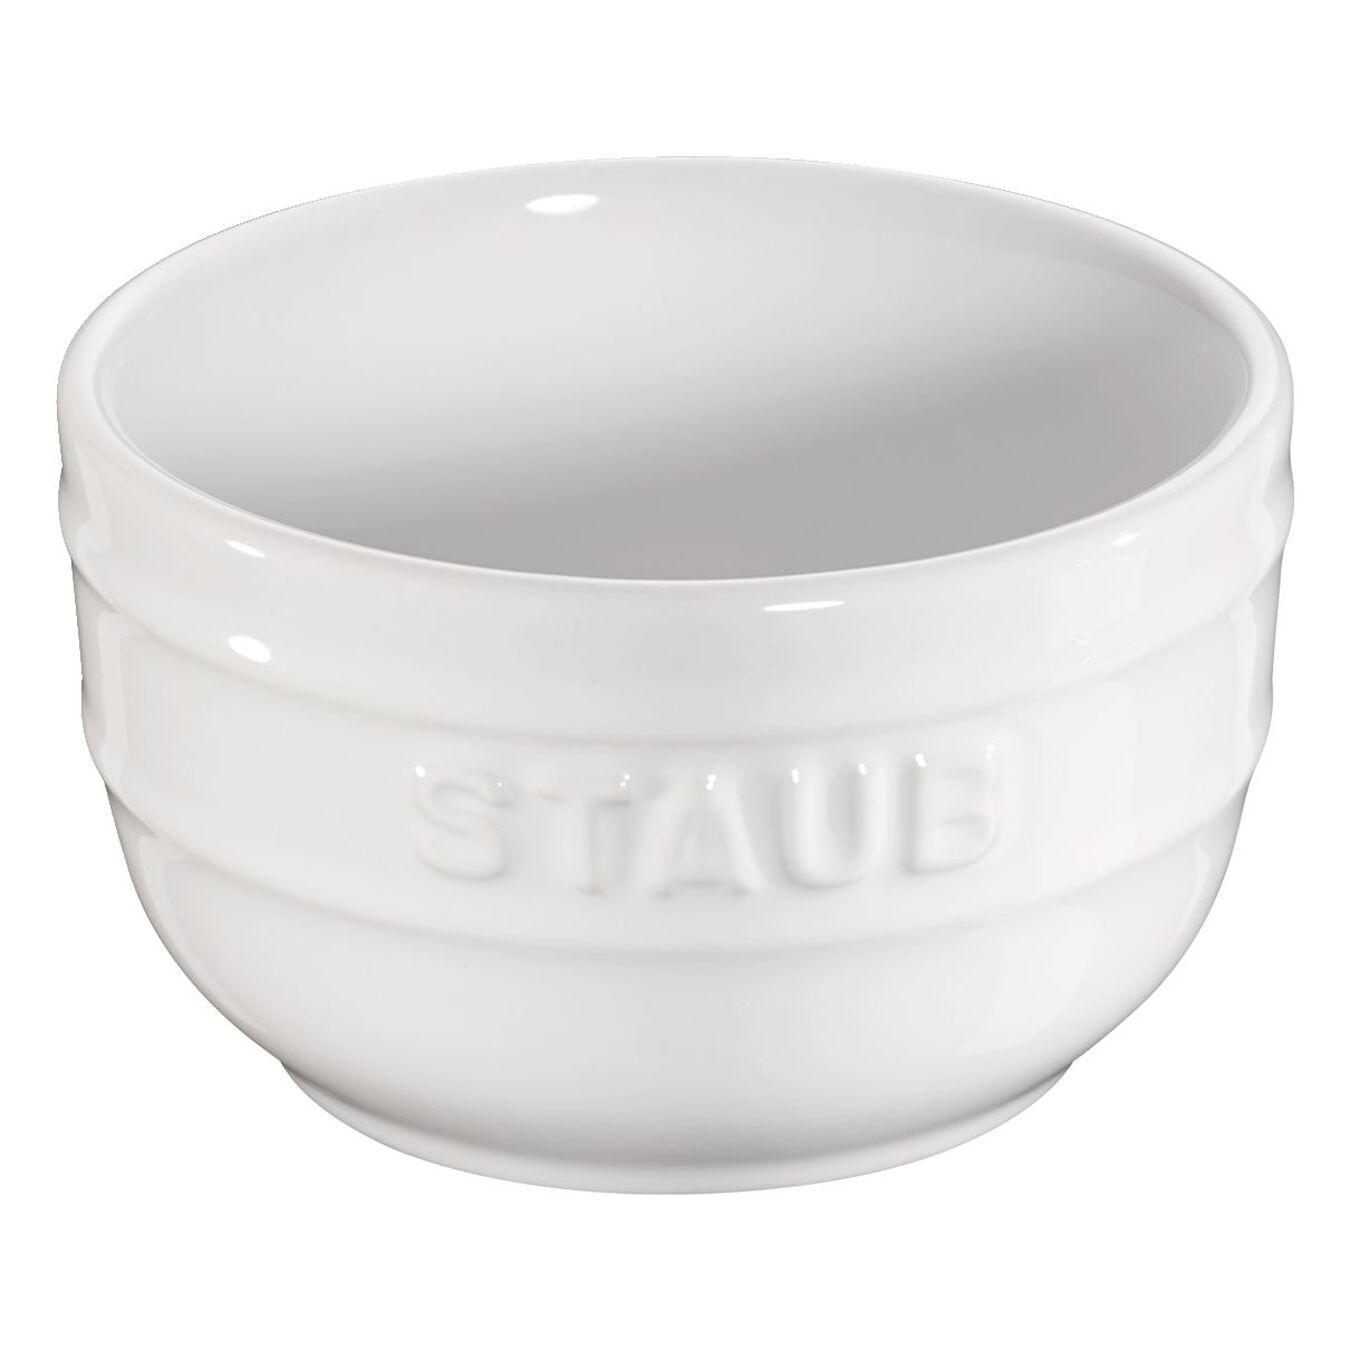 2-pc Prep Bowl Set - White,,large 1